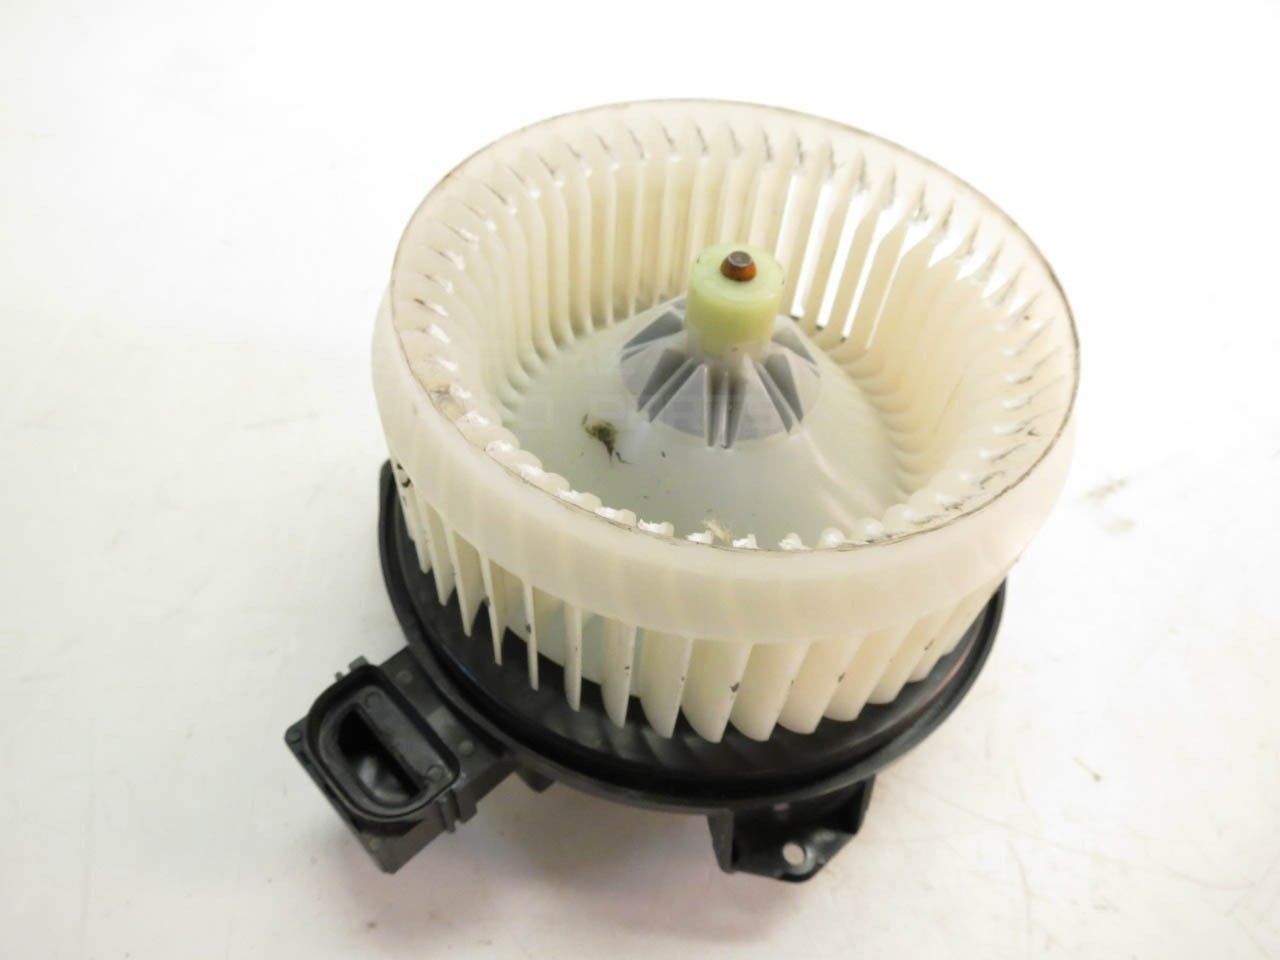 Honda Accord 08 12 Heater Blower Motor Fan 79310 Ta0 A01 Oem 1992 Replacement Repalcement